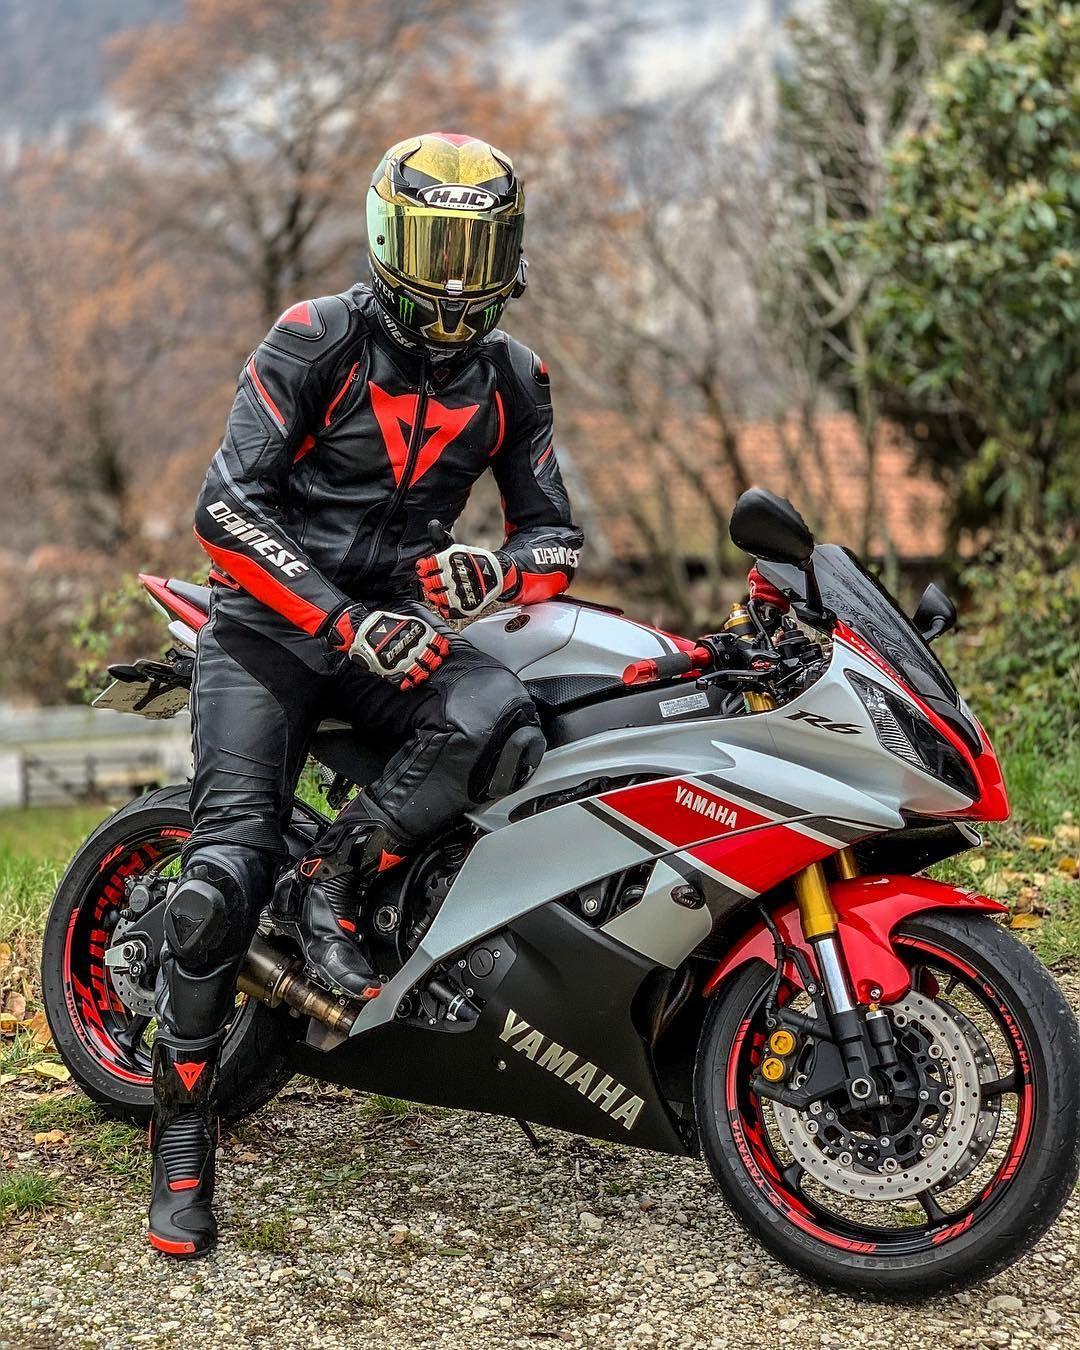 Moto Bike Instamotogallery Motorcycle Dainese Motolife